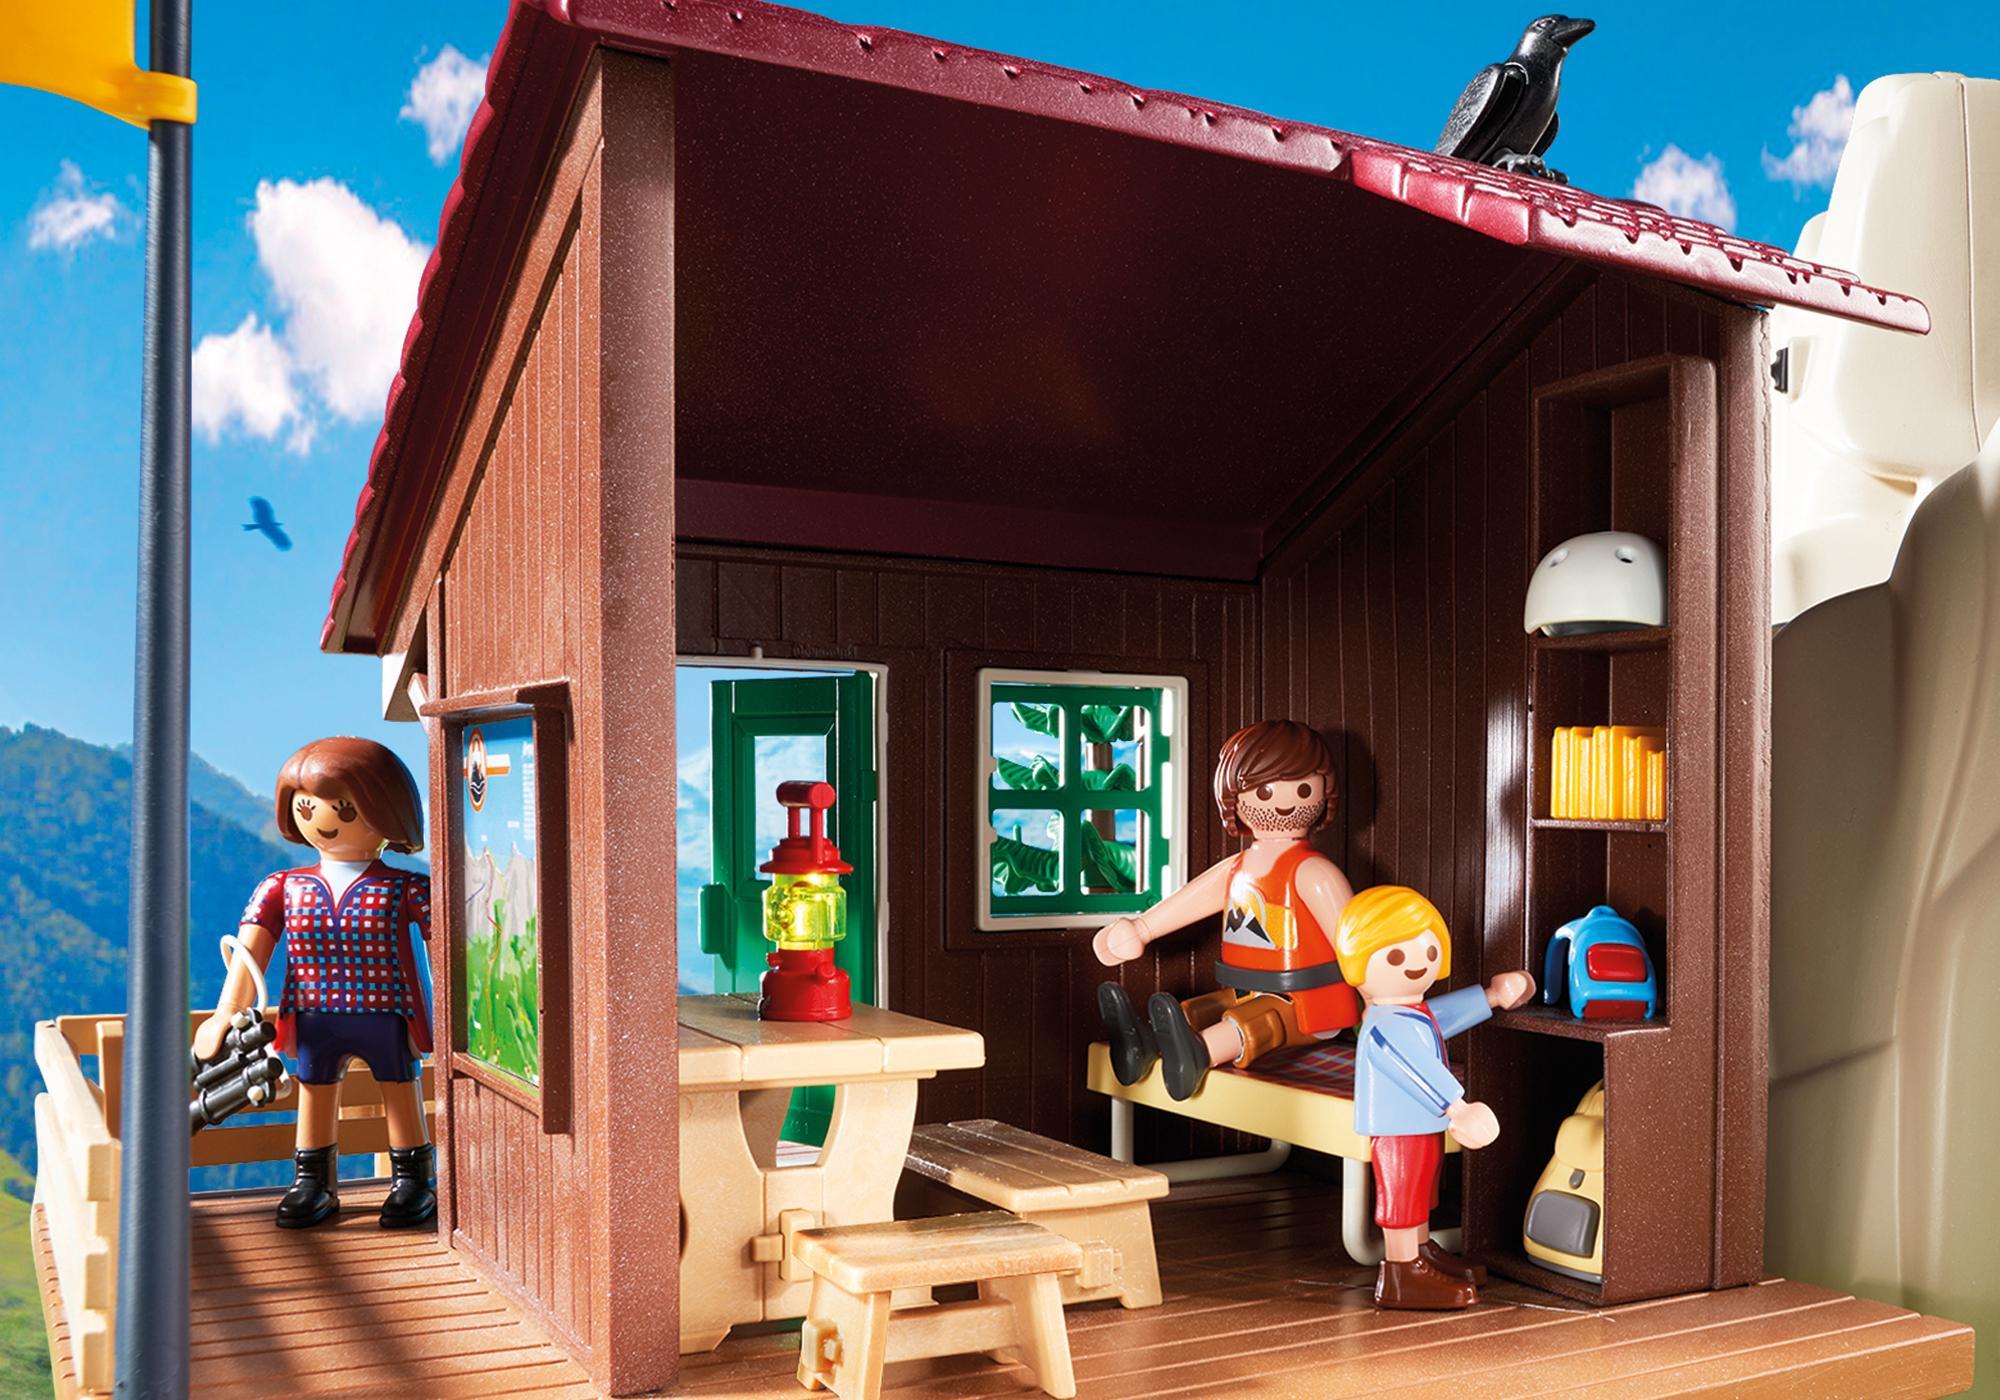 http://media.playmobil.com/i/playmobil/9126_product_extra4/Rock Climbers with Cabin